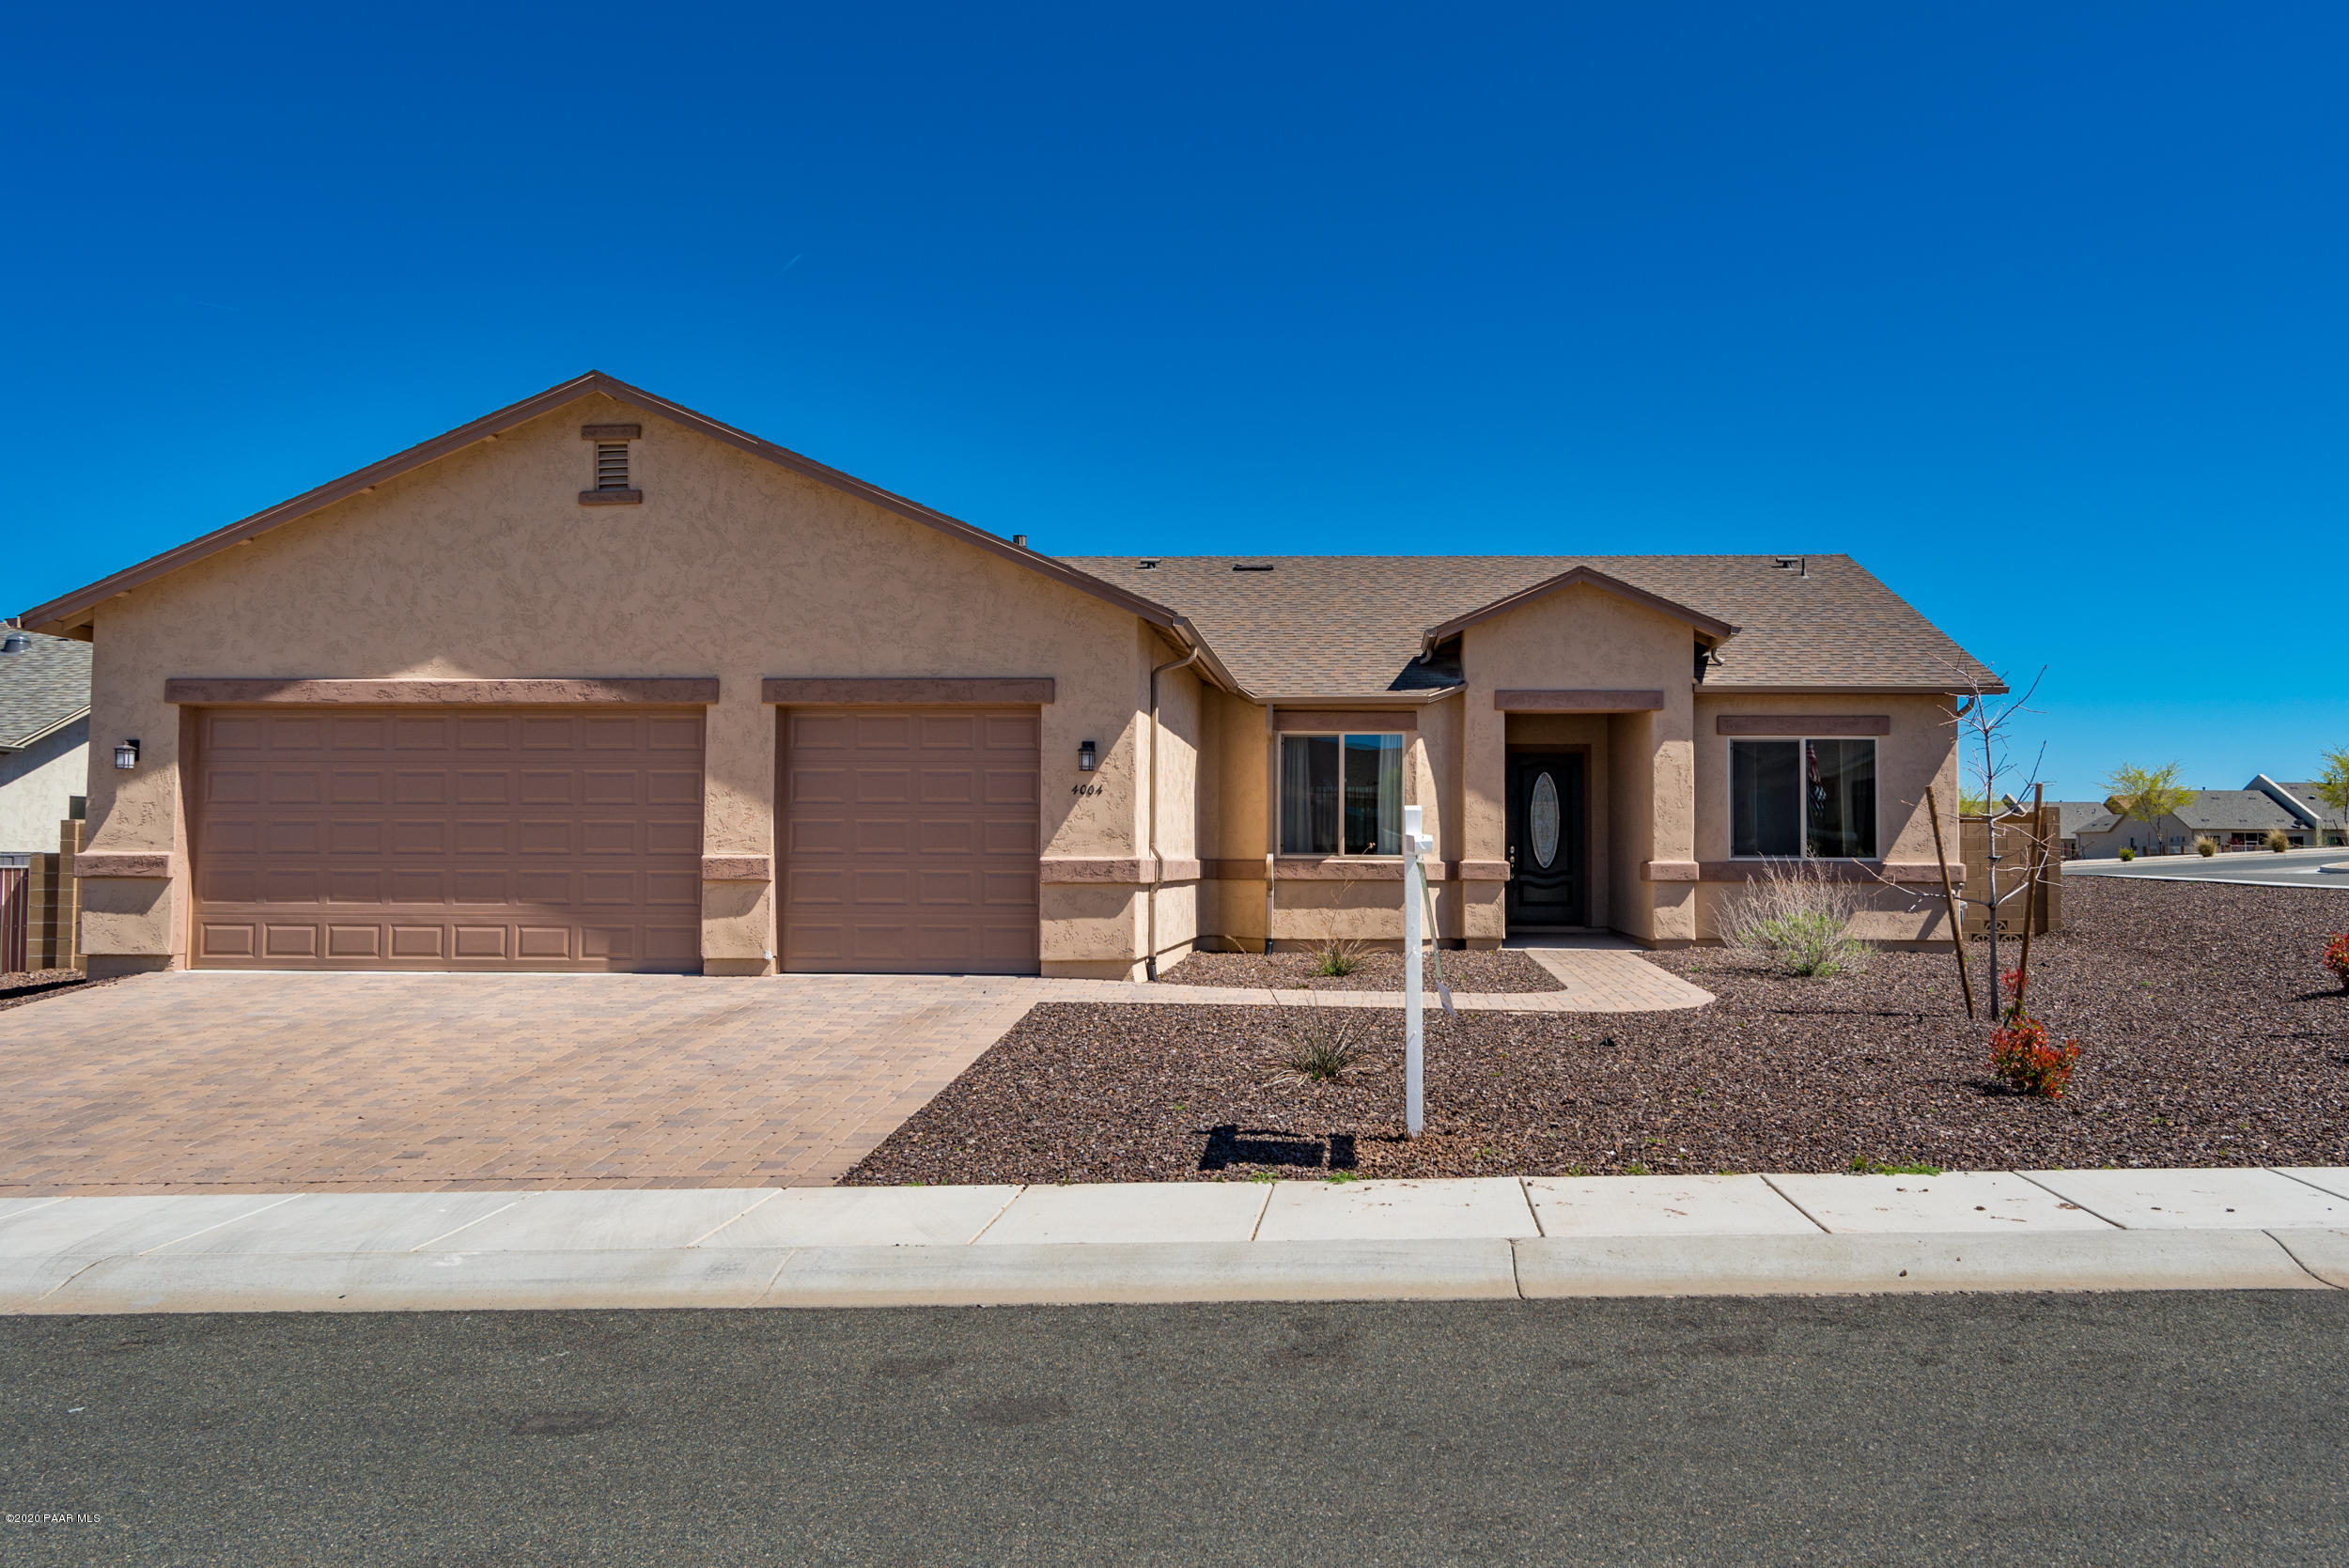 Photo of 4004 Pembroke, Prescott Valley, AZ 86314